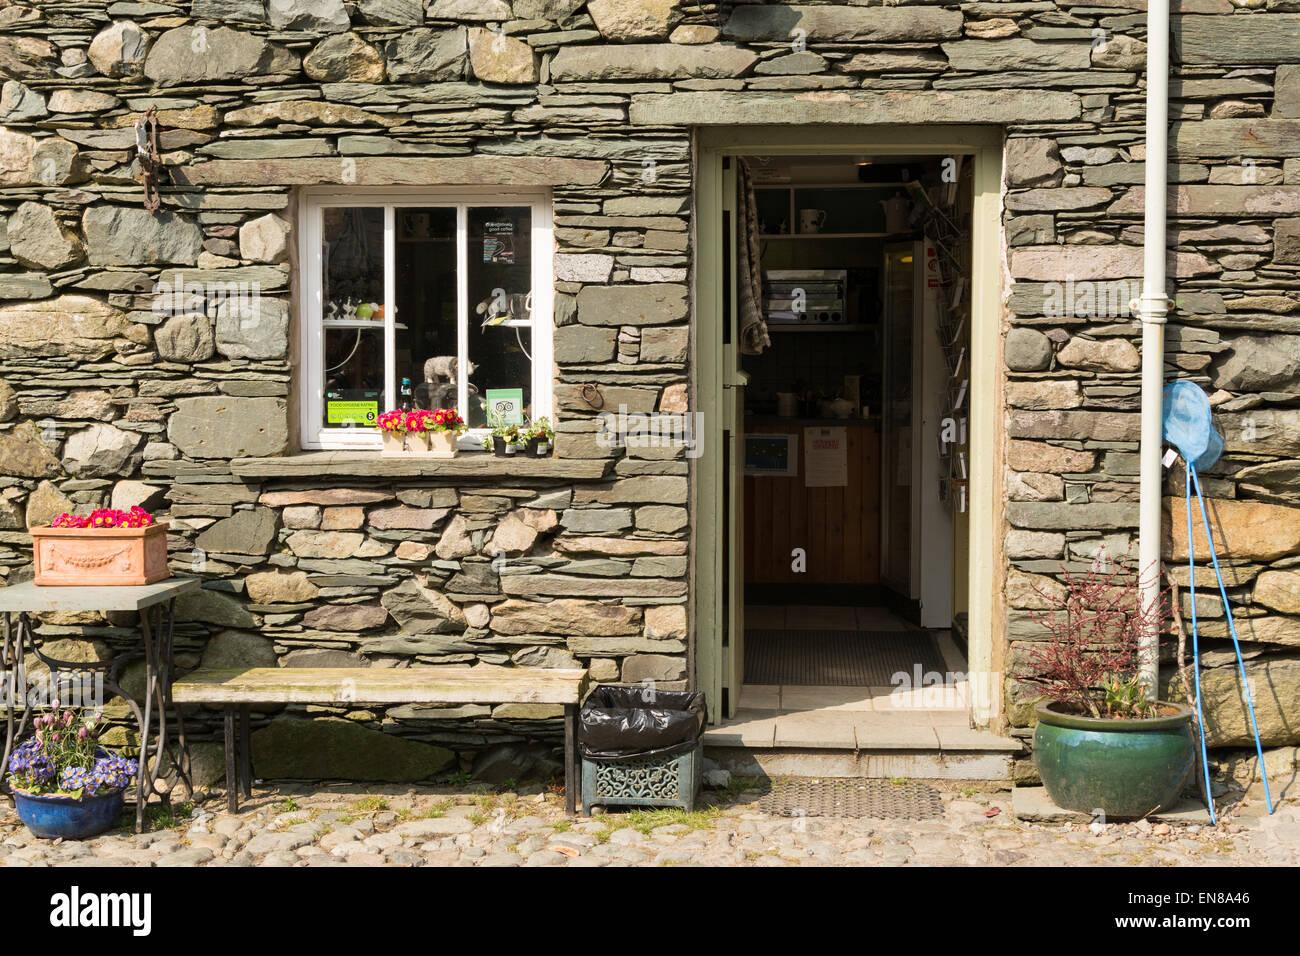 ROSTHWAITE, BORROWDALE, LAKE DISTRICT, CUMBRIA, ENGLAND, UK - 9 APRIL 2015: Entrance to Flock-in walkers Tea Room, - Stock Image